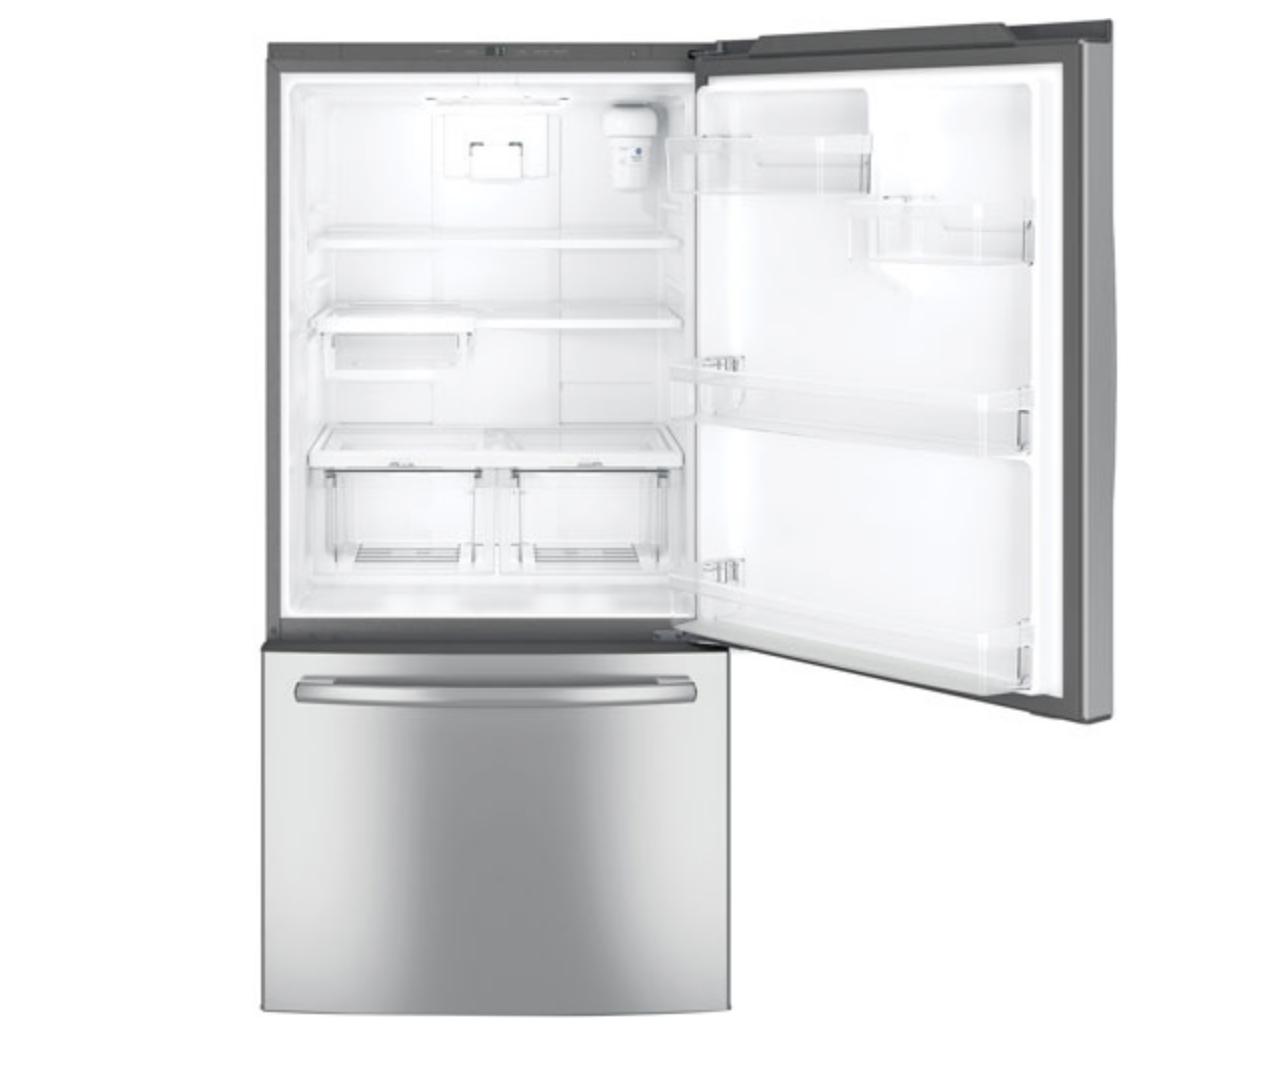 Bottom freezer fridge